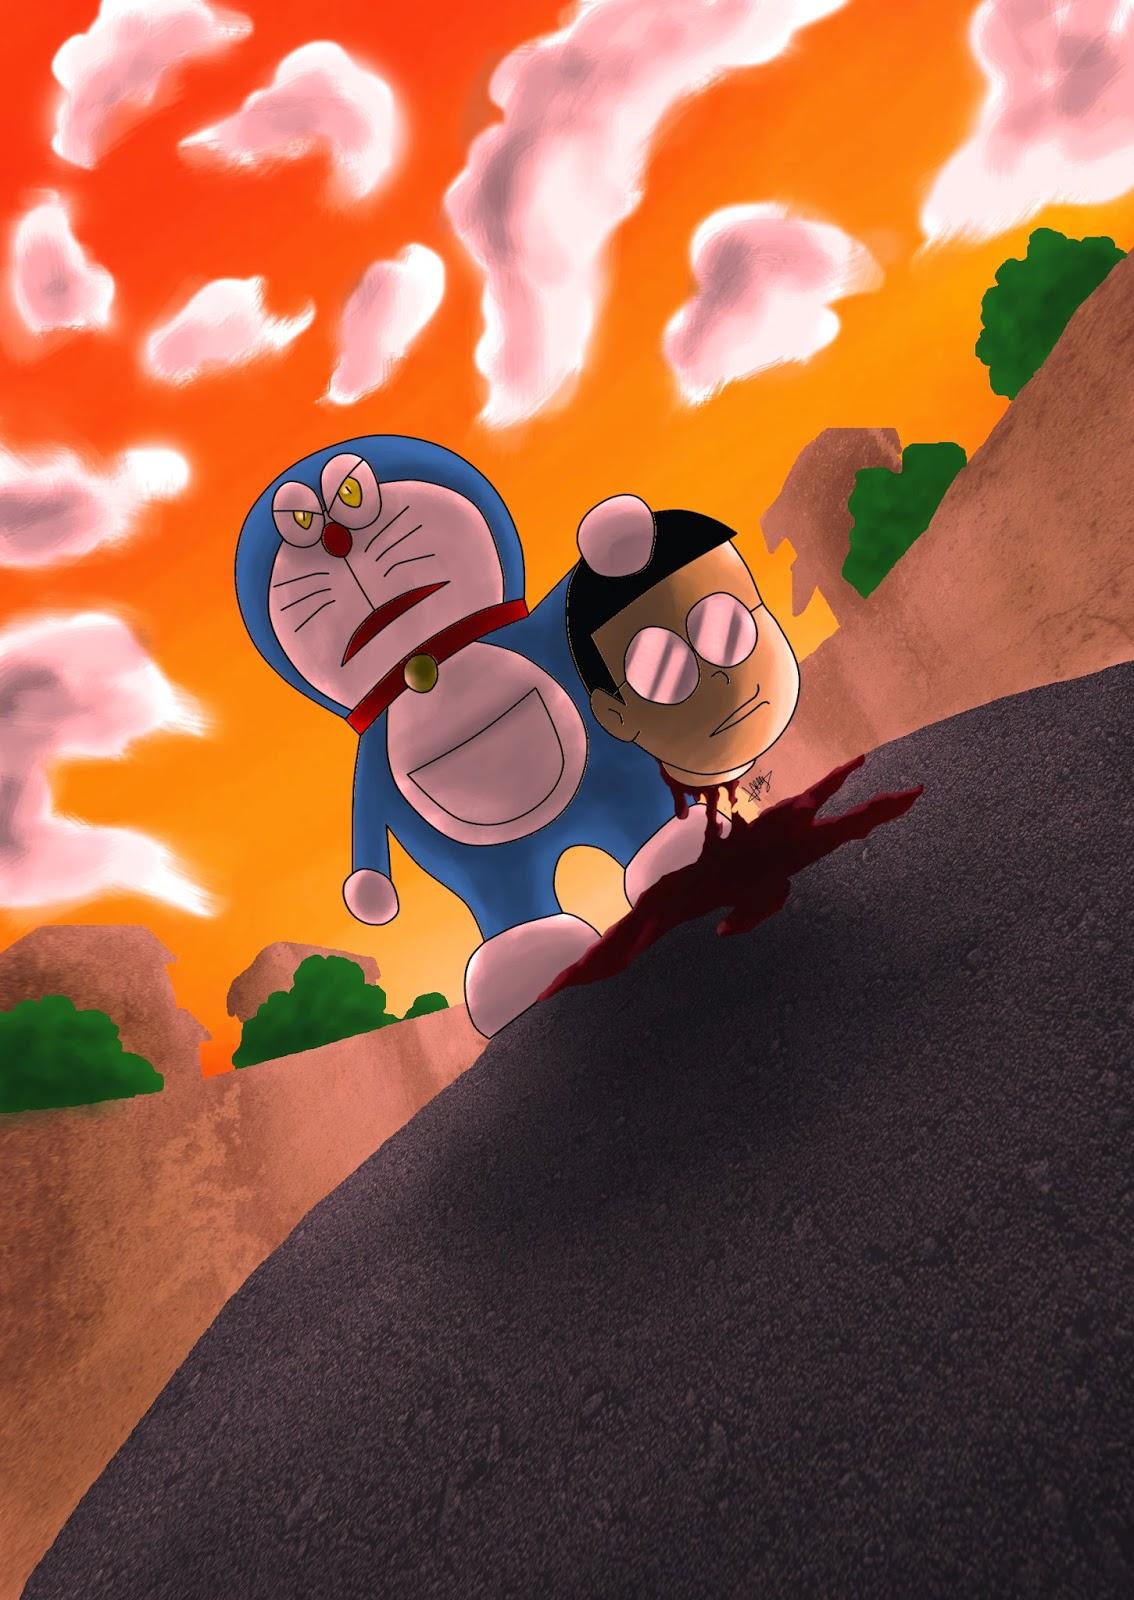 doraemon,nobita,killed